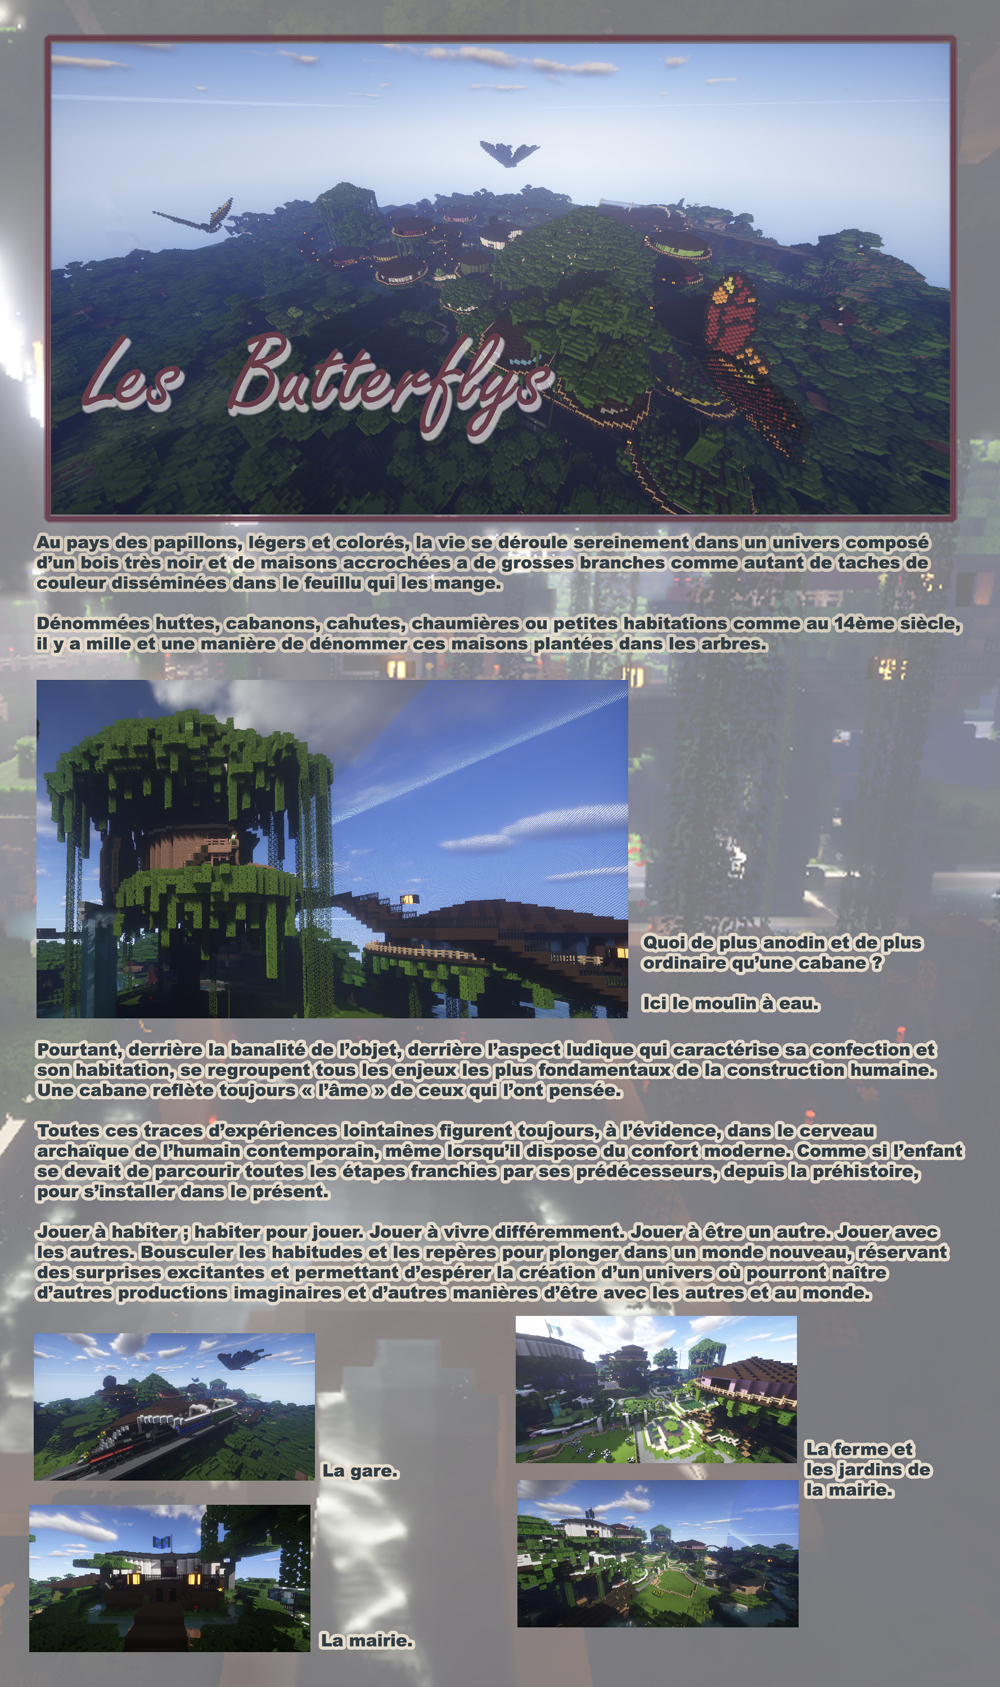 [Archive] Village des Butterflys - Menka - seconde présentation 289632prsentationseconde